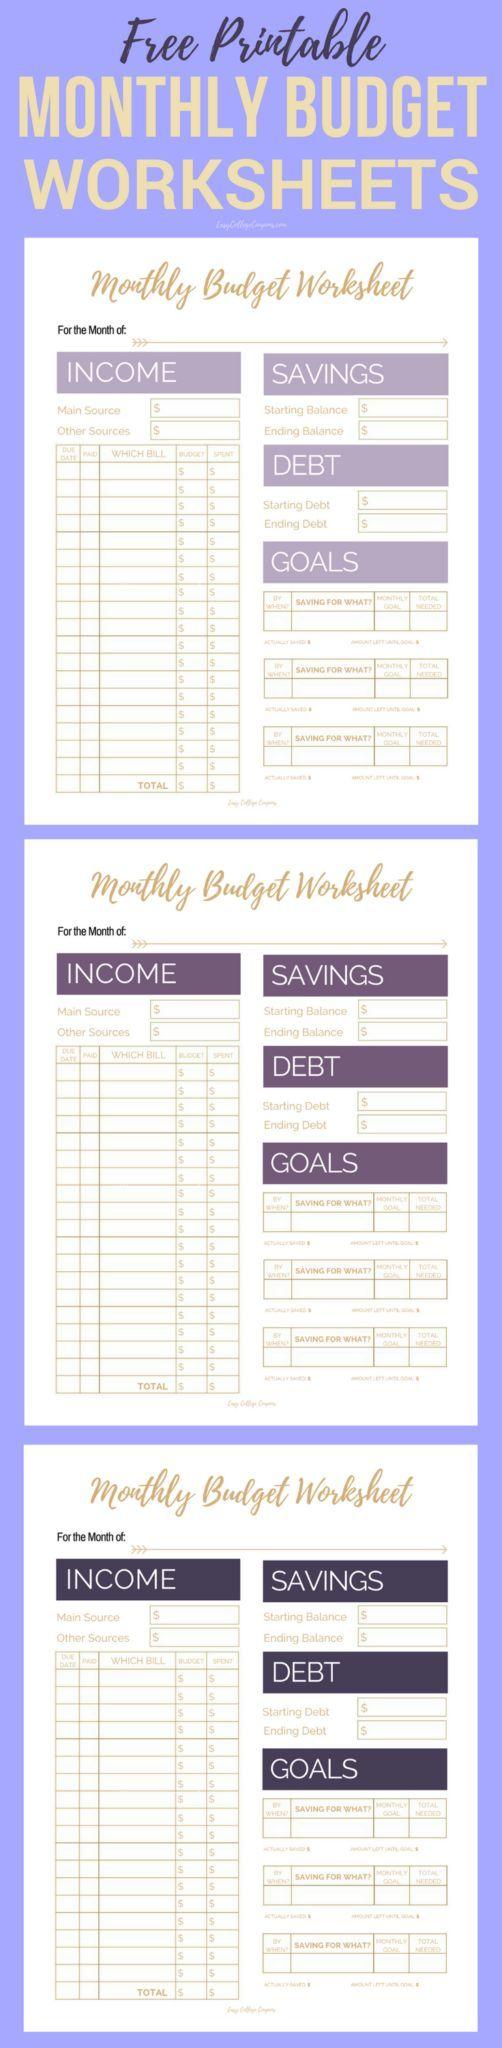 Worksheets Printable Budget Worksheet best 25 printable budget sheets ideas on pinterest free monthly worksheets